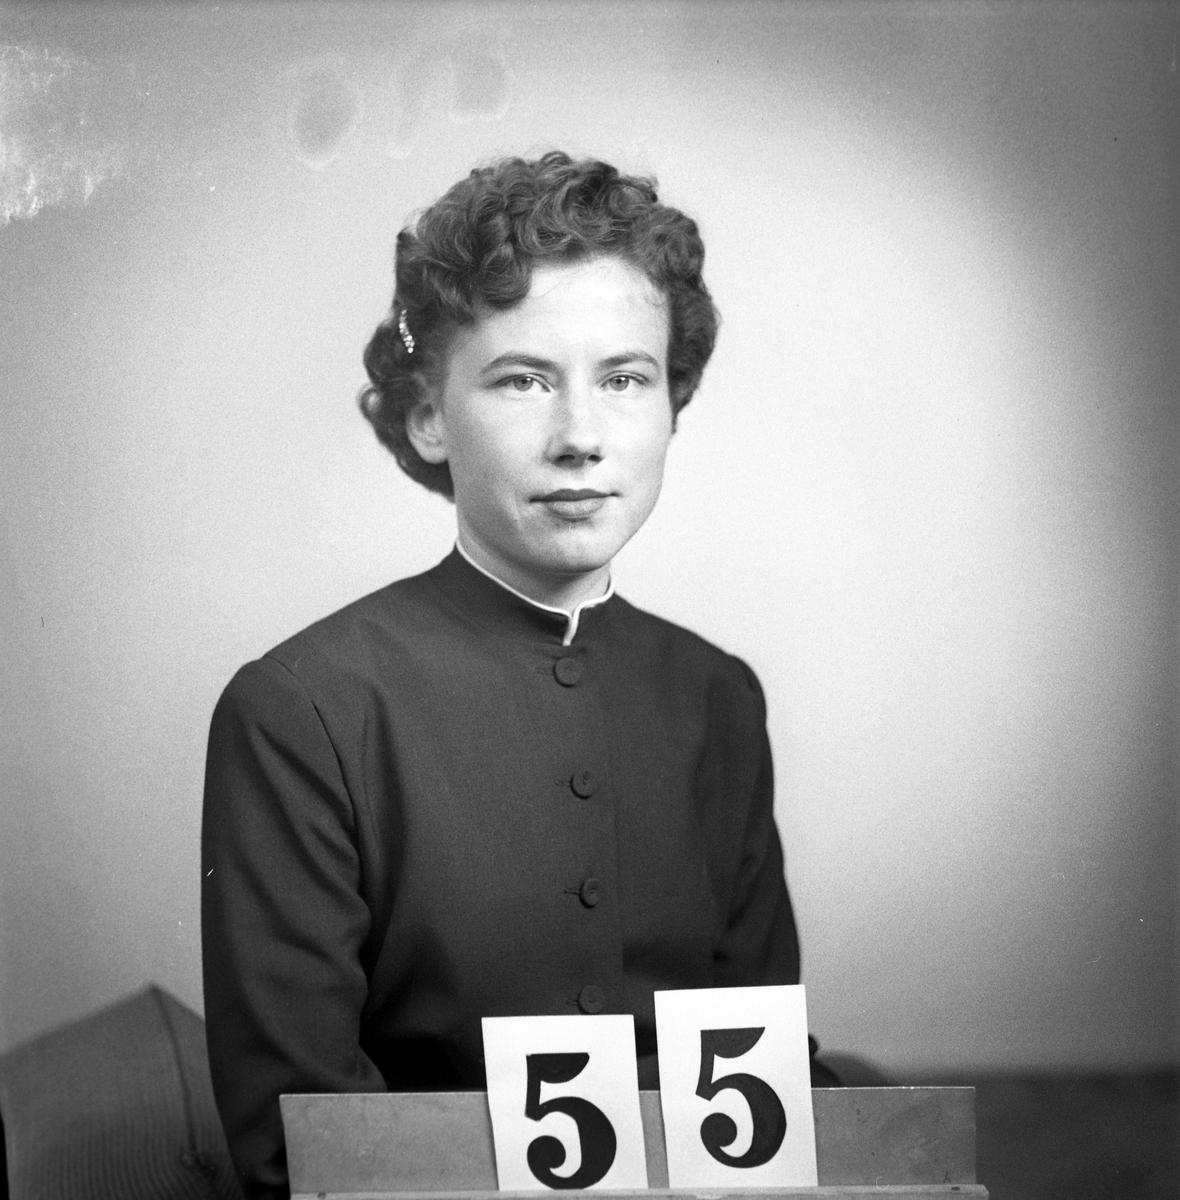 Telegrafverket legitimationskort. April 1952. Fotografi nr 55.